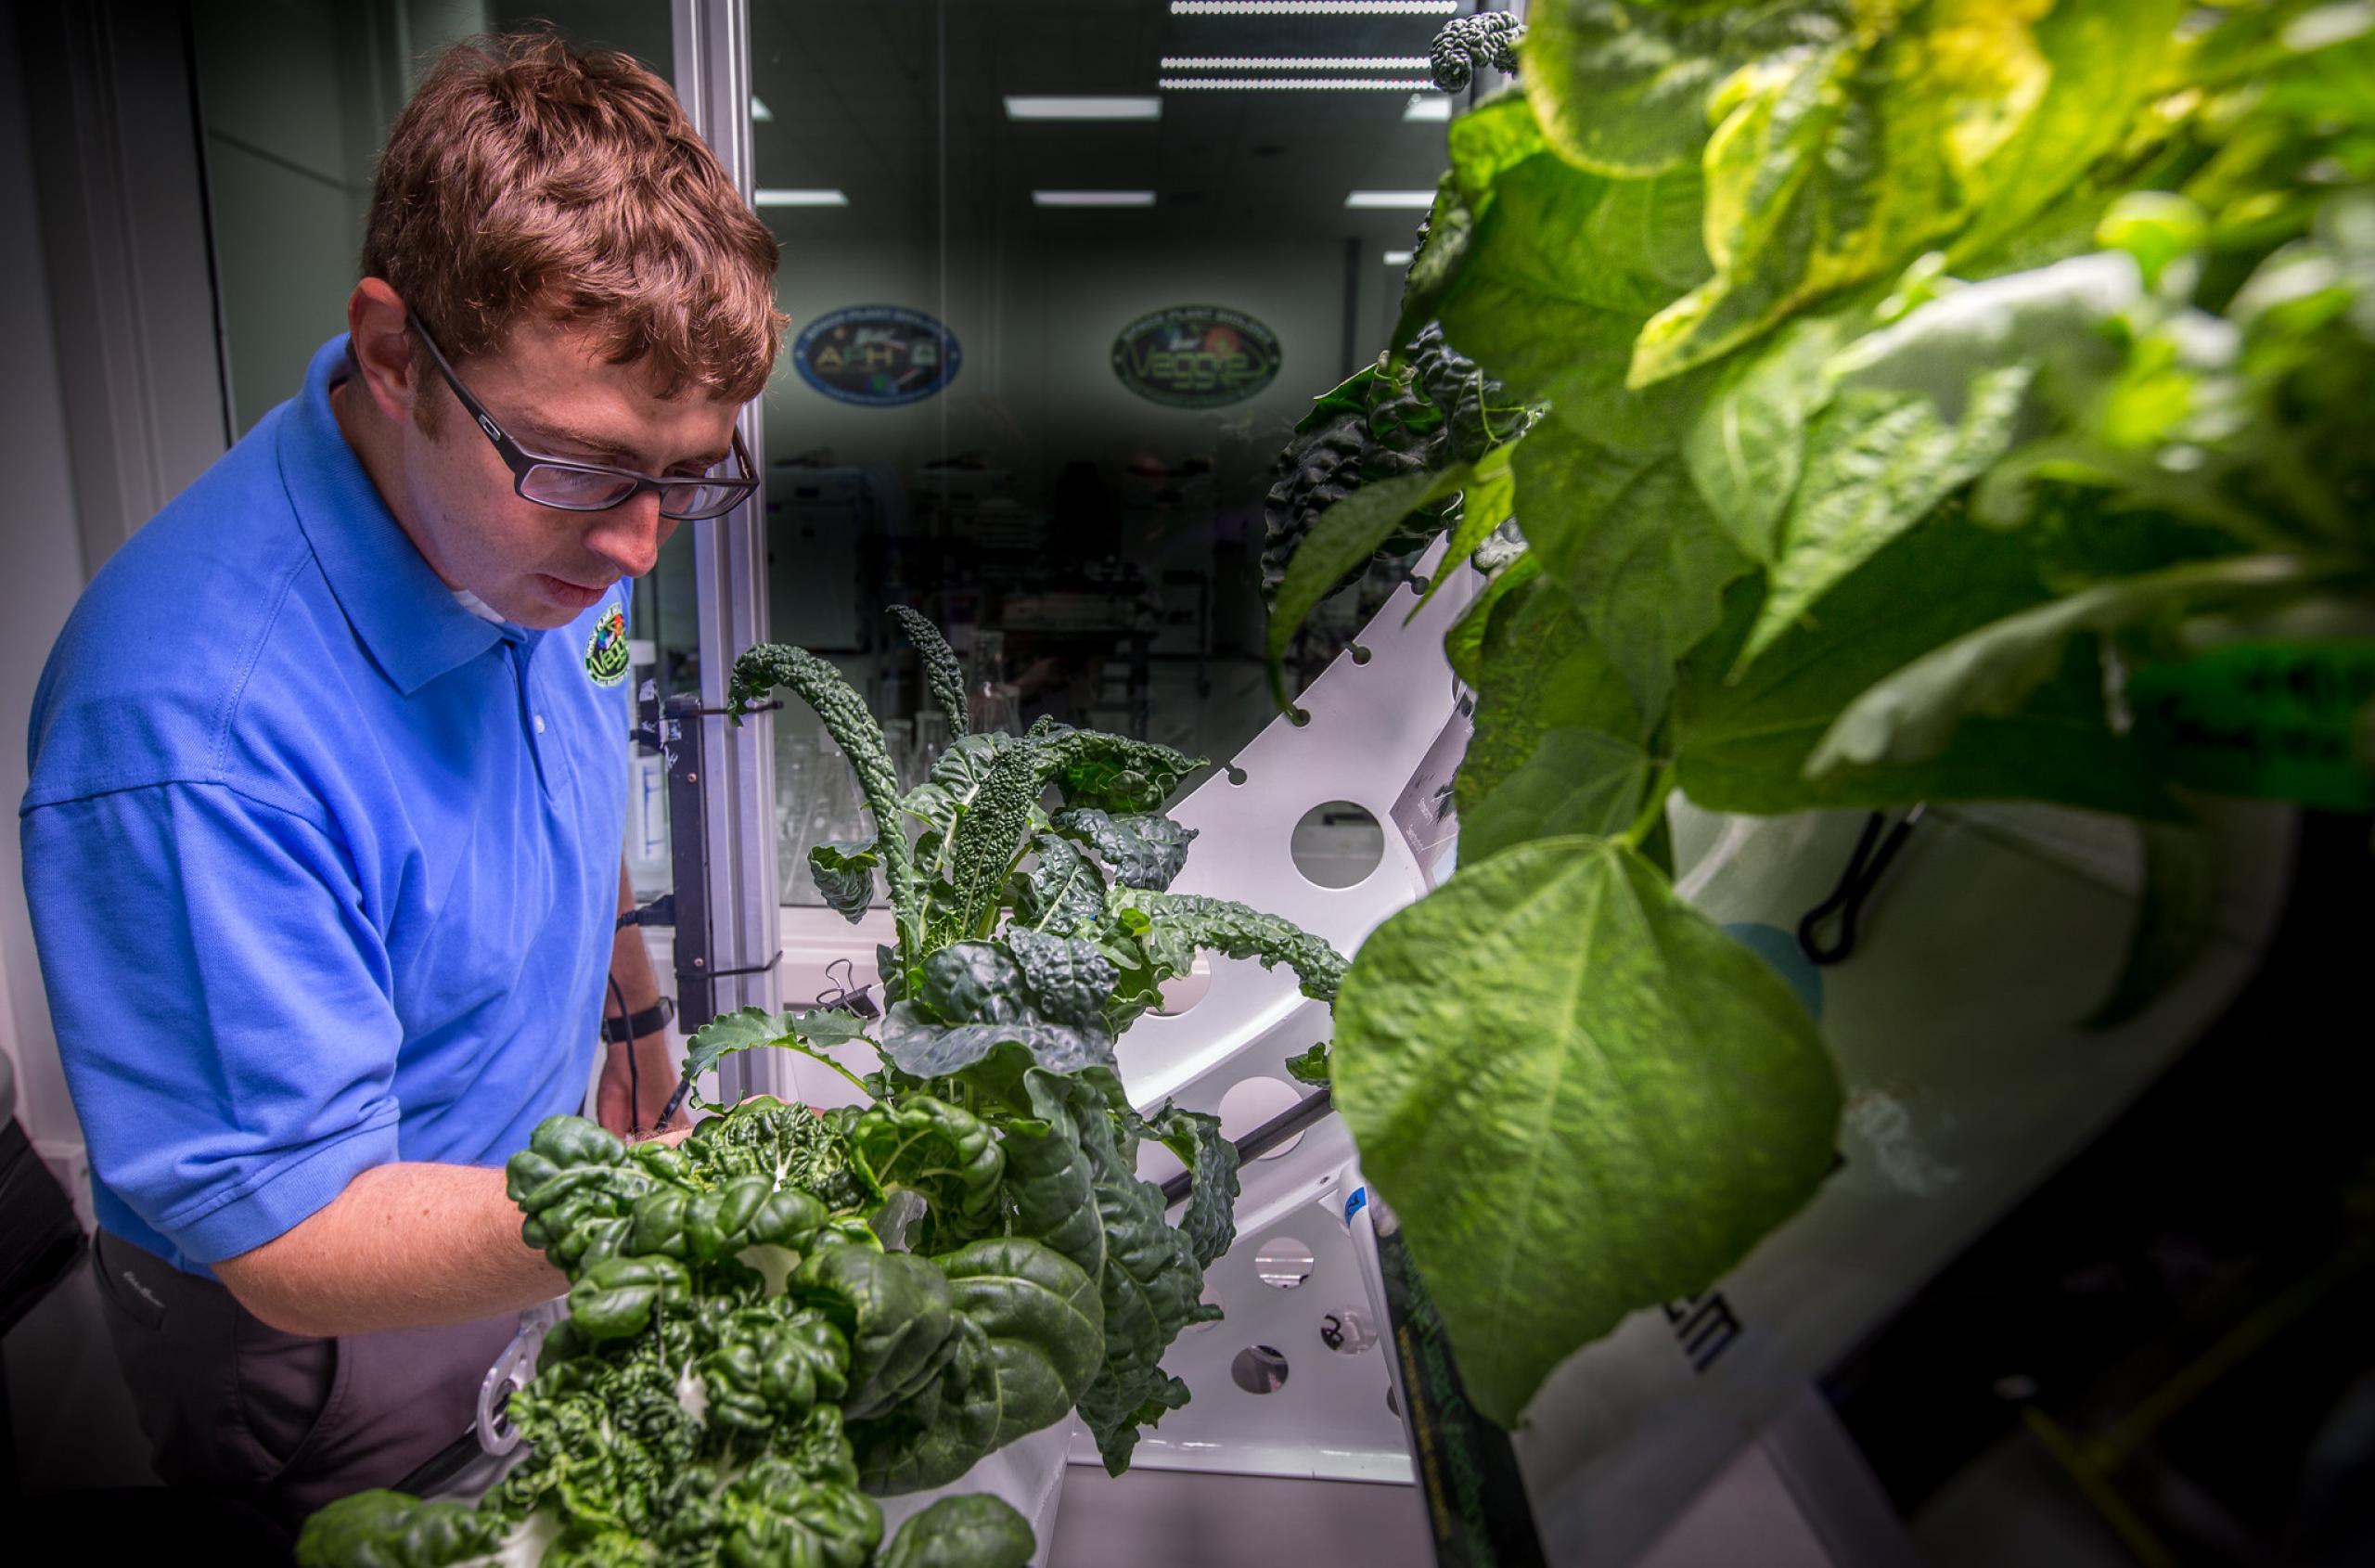 Man tending to vegetation growing in a lab.